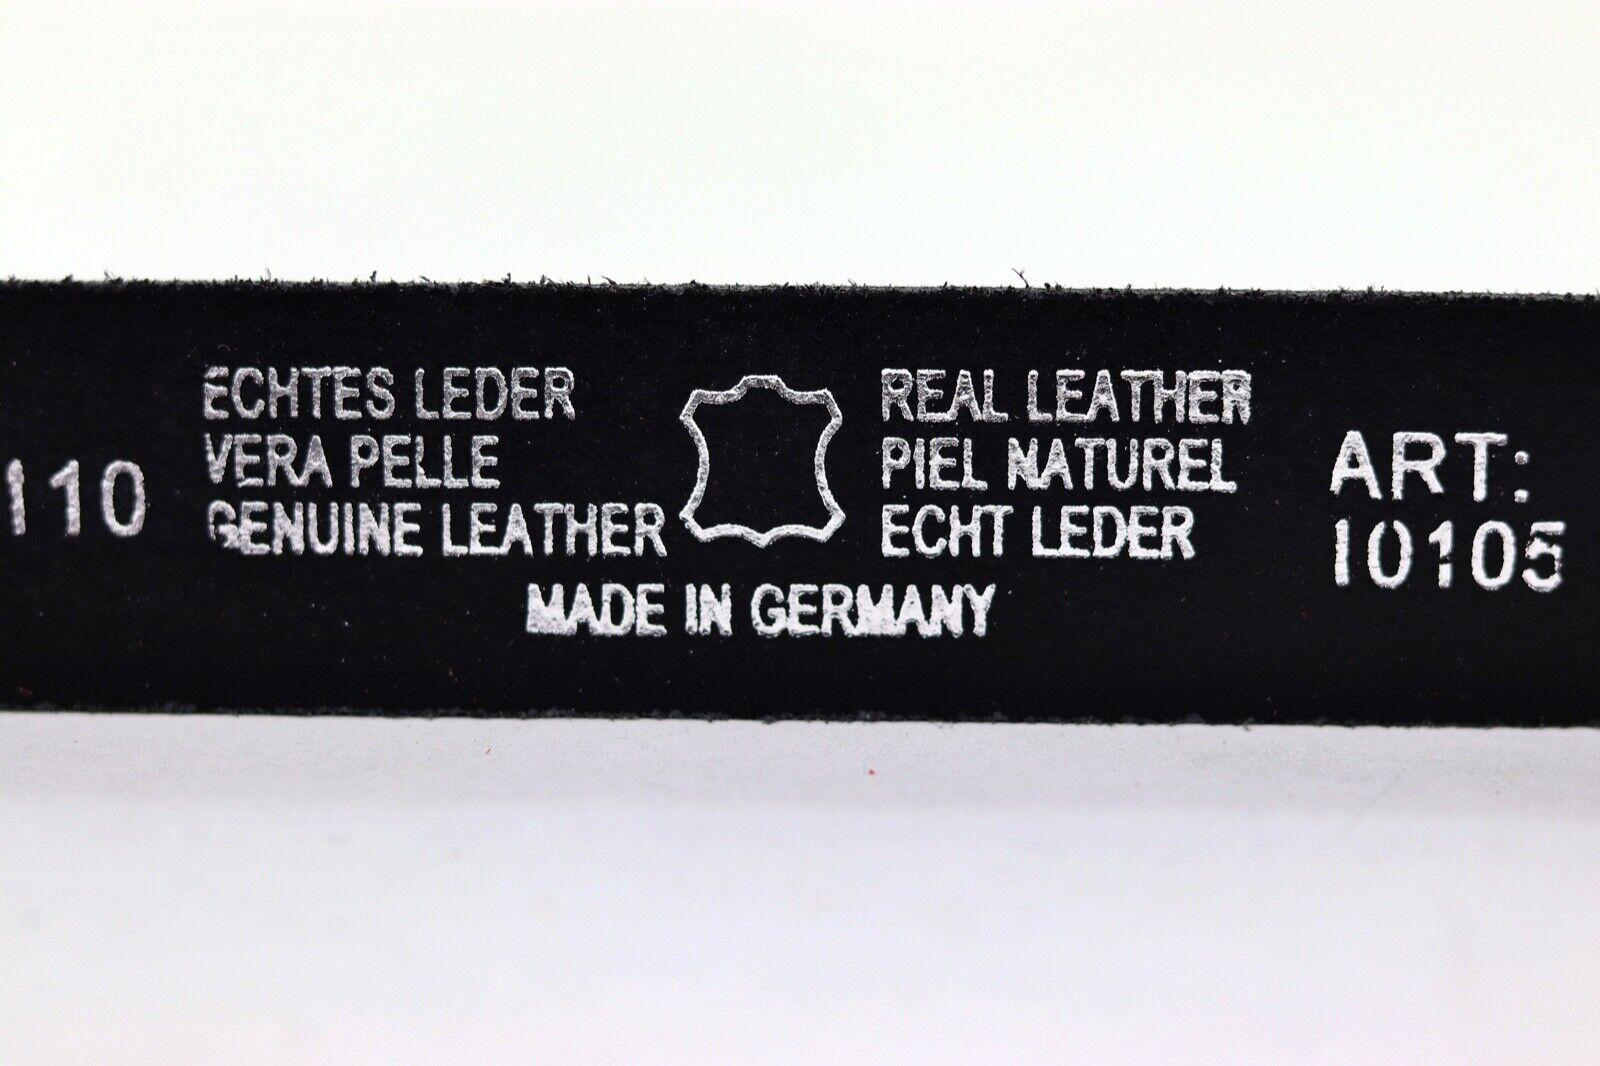 Ledergürtel Weiß Echtleder Rindleder Jeansgürtel Herren Damen 100% echt